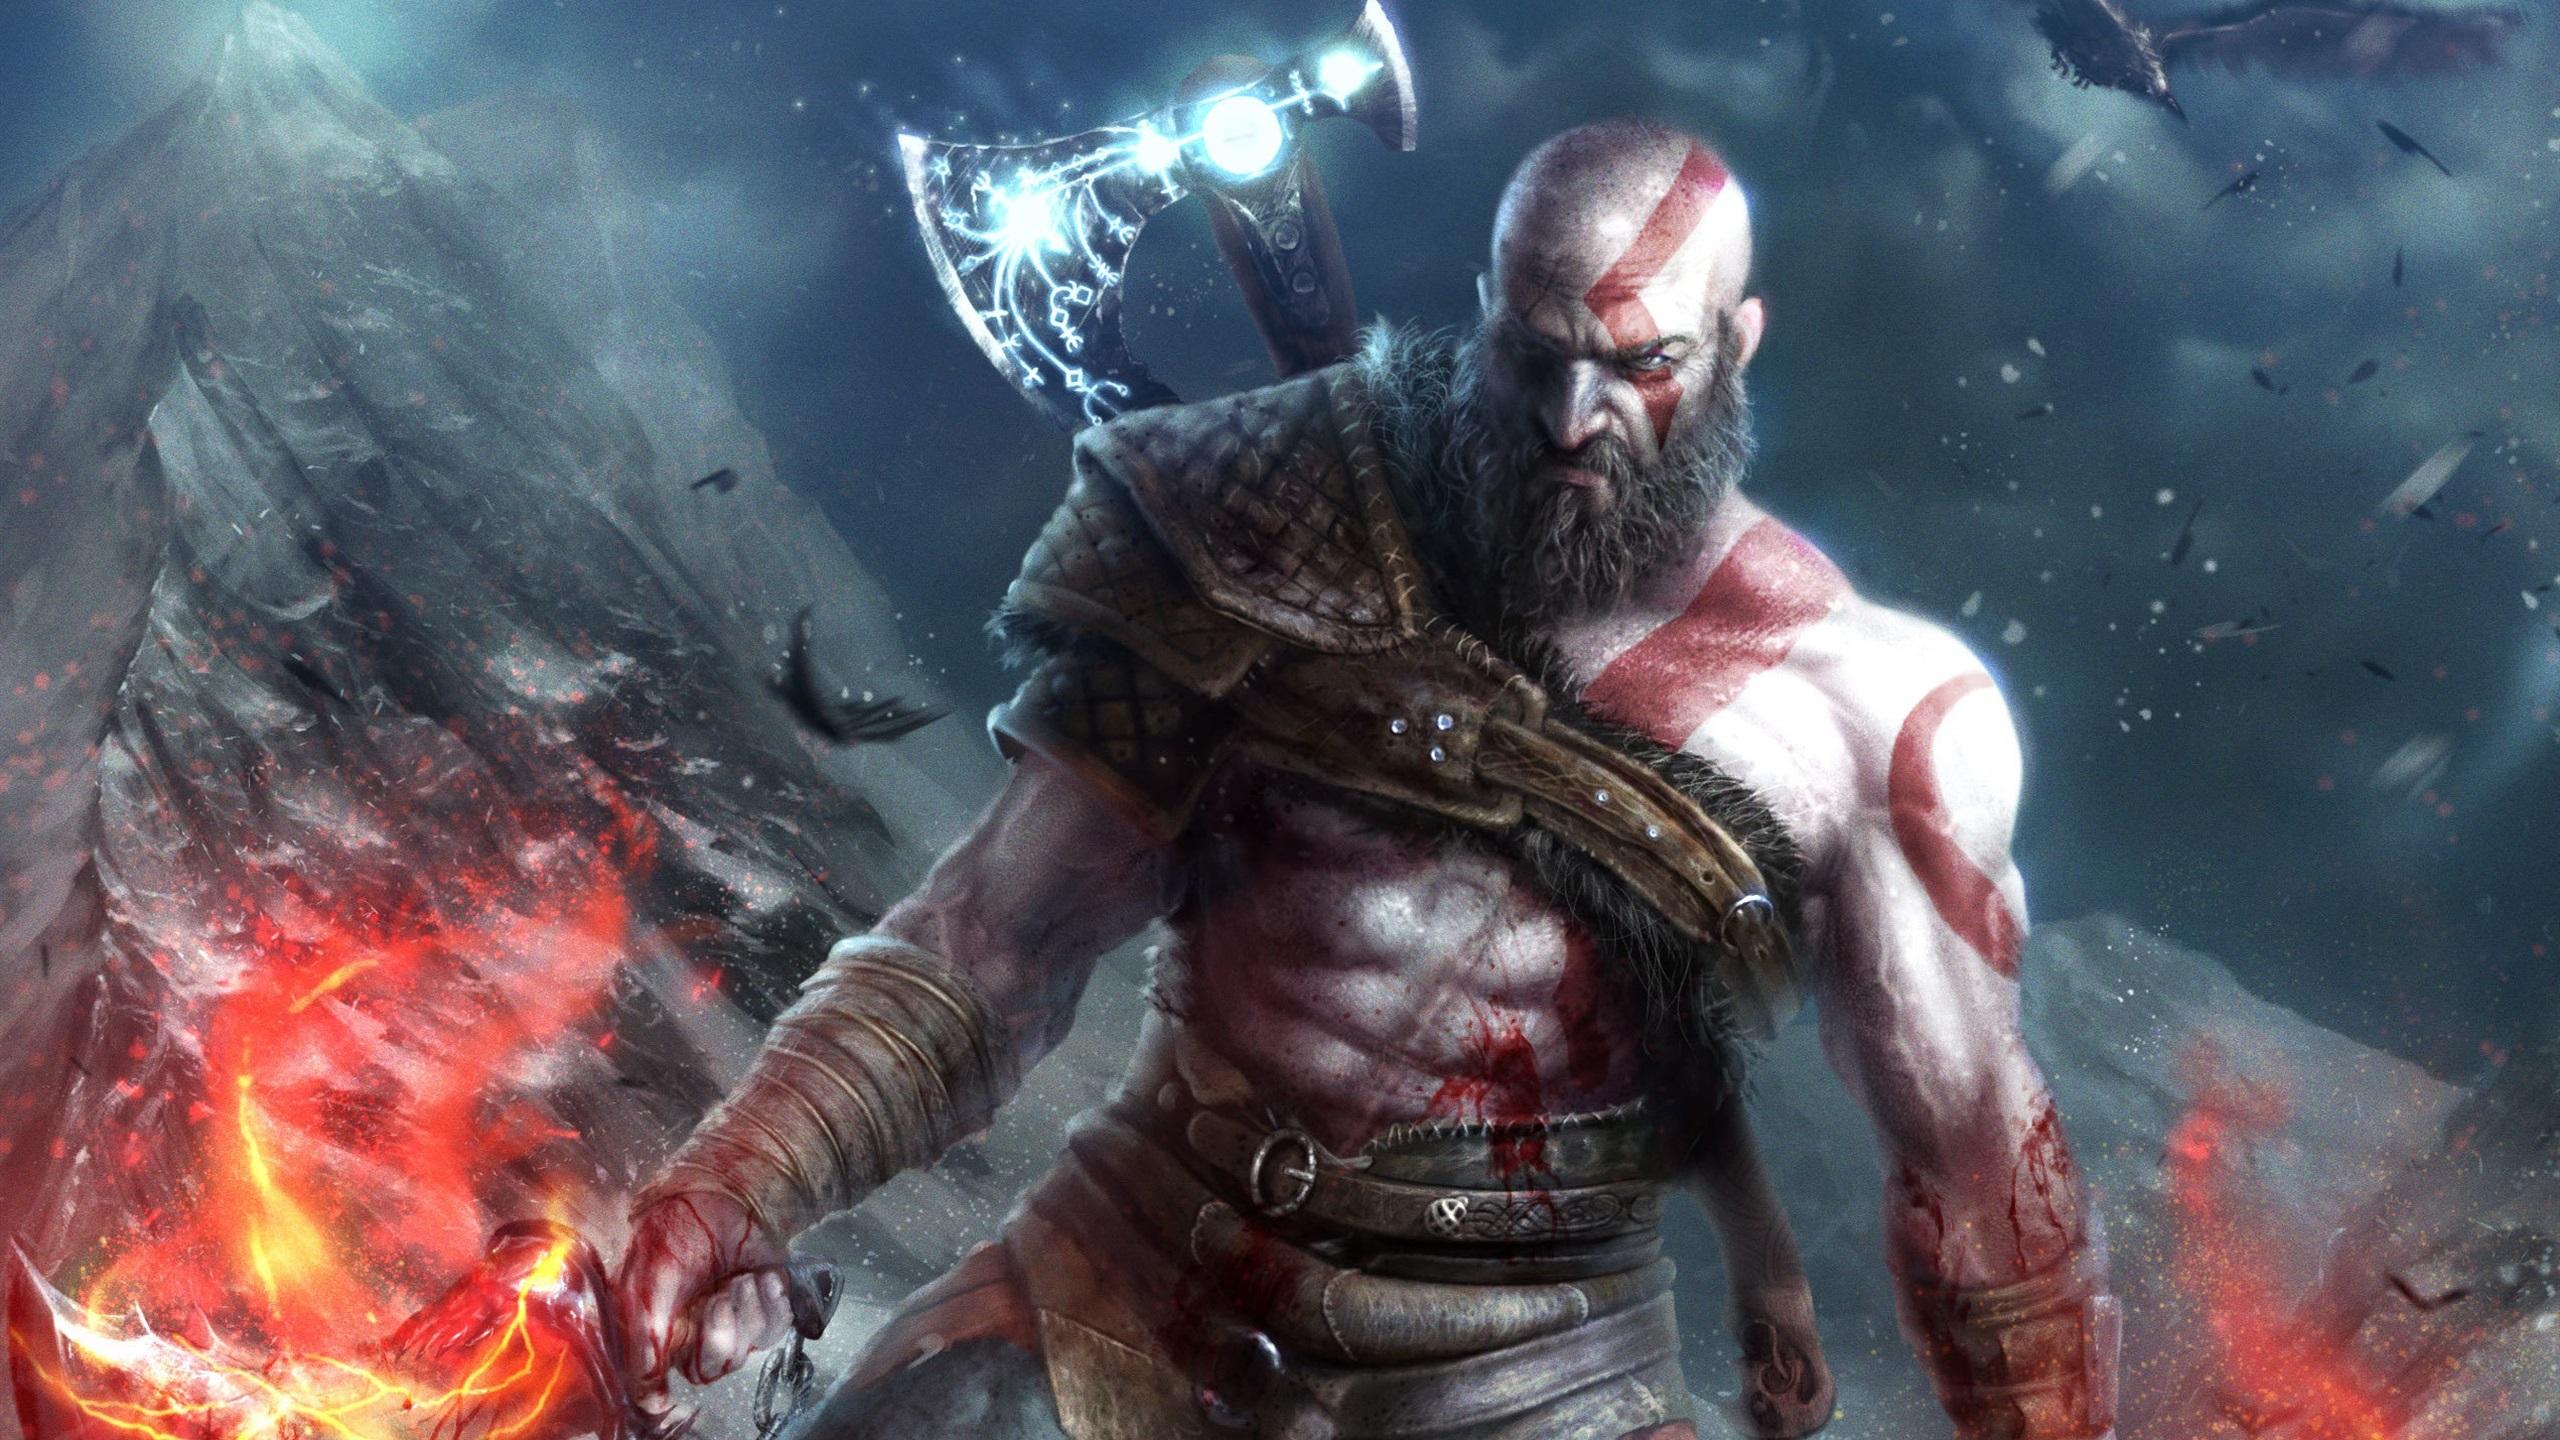 God Of War 4 Videospiele 2560x1600 Hd Hintergrundbilder Hd